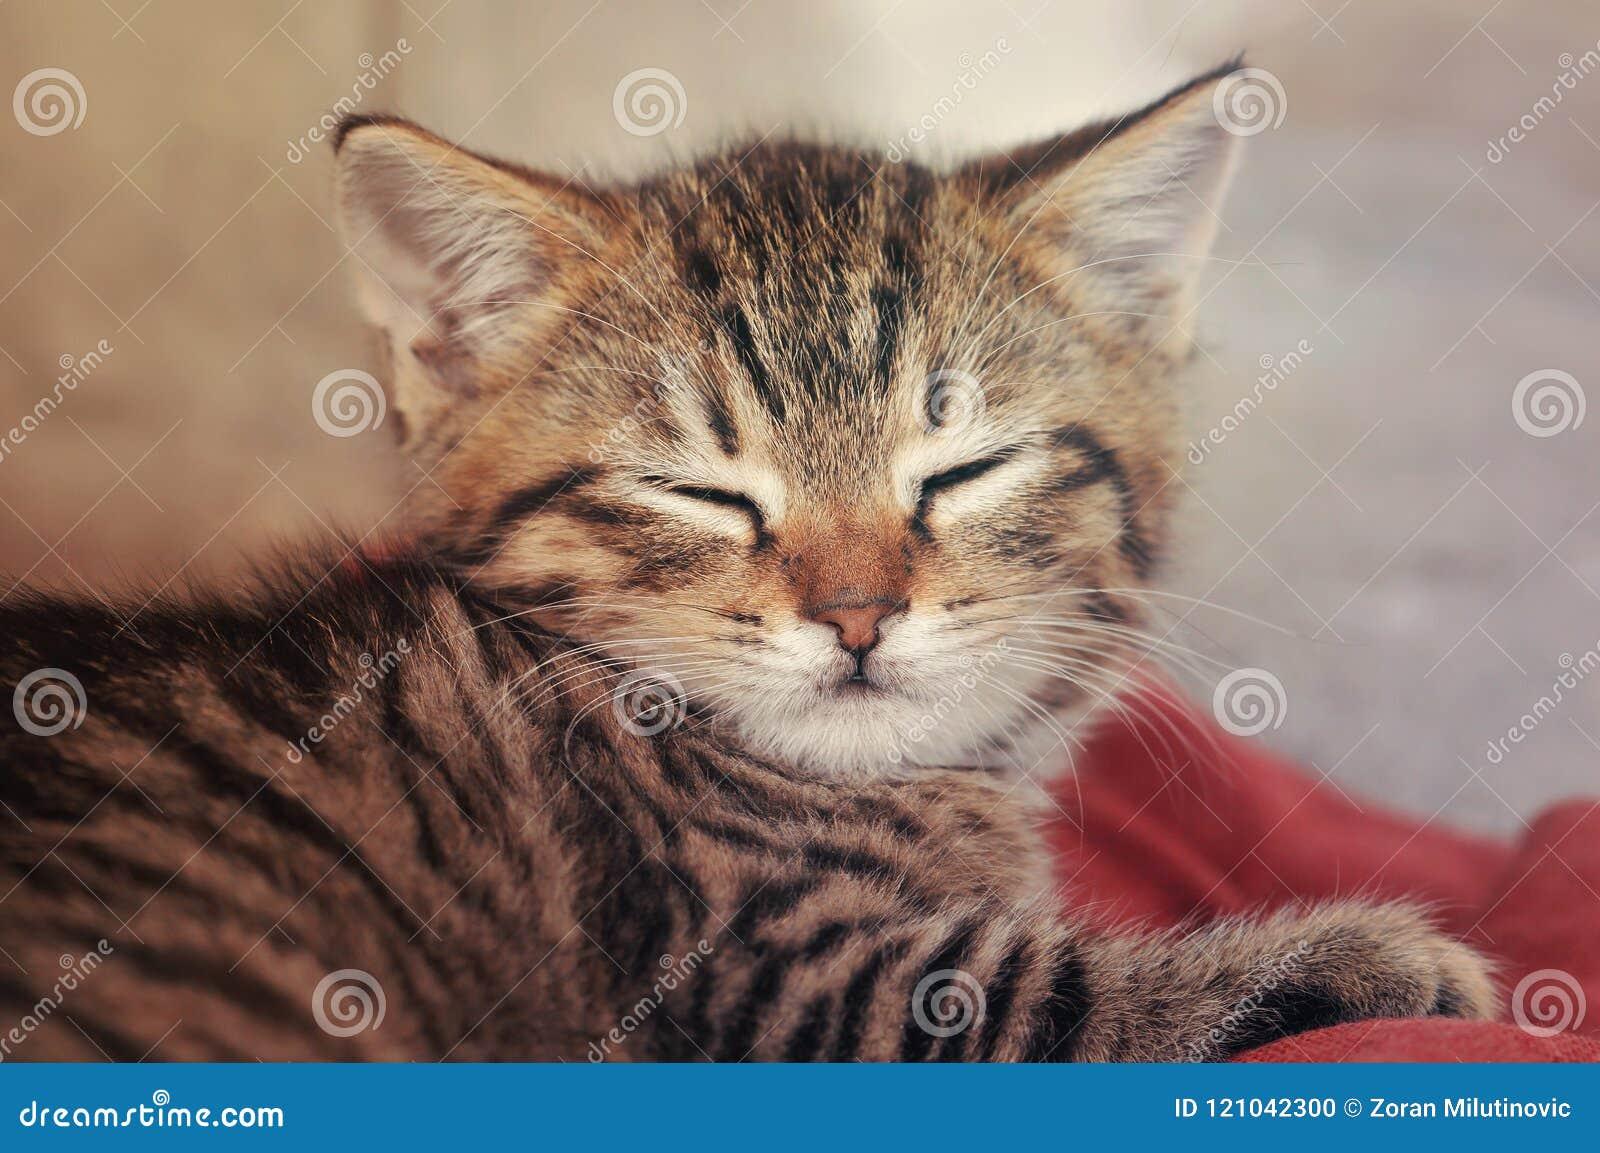 Derribo del gatito del gato atigrado soñoliento